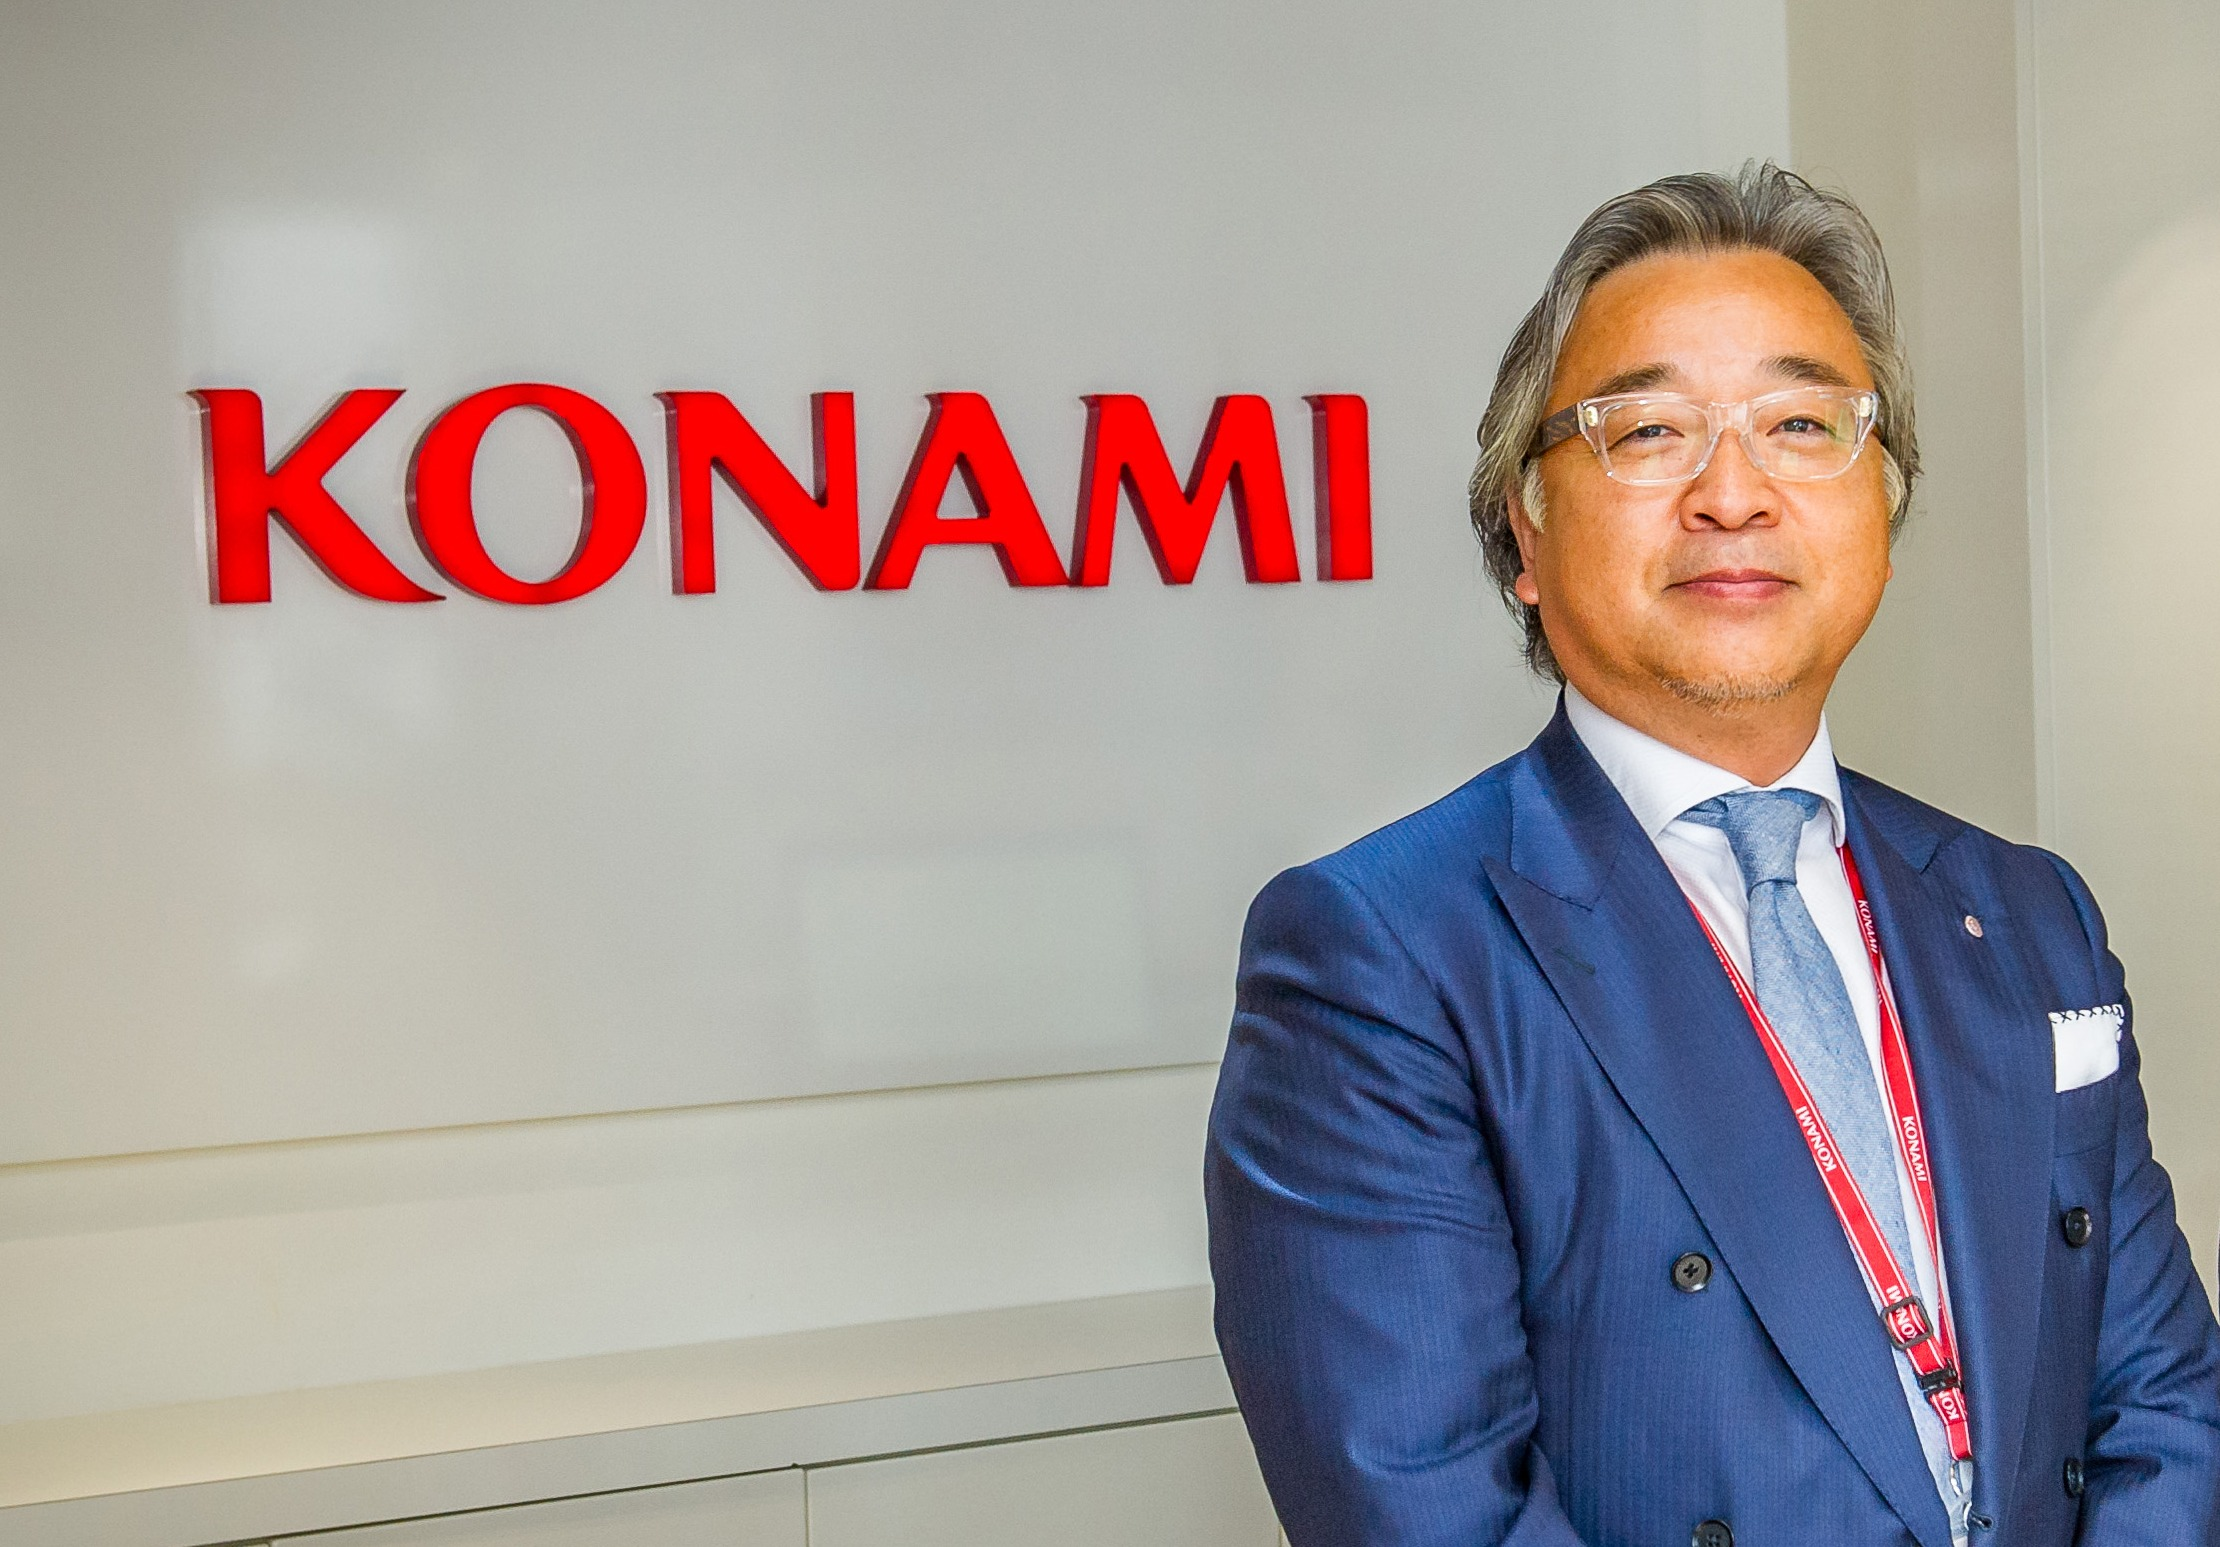 Konami Masami Saso, Konami mobile, Konami future